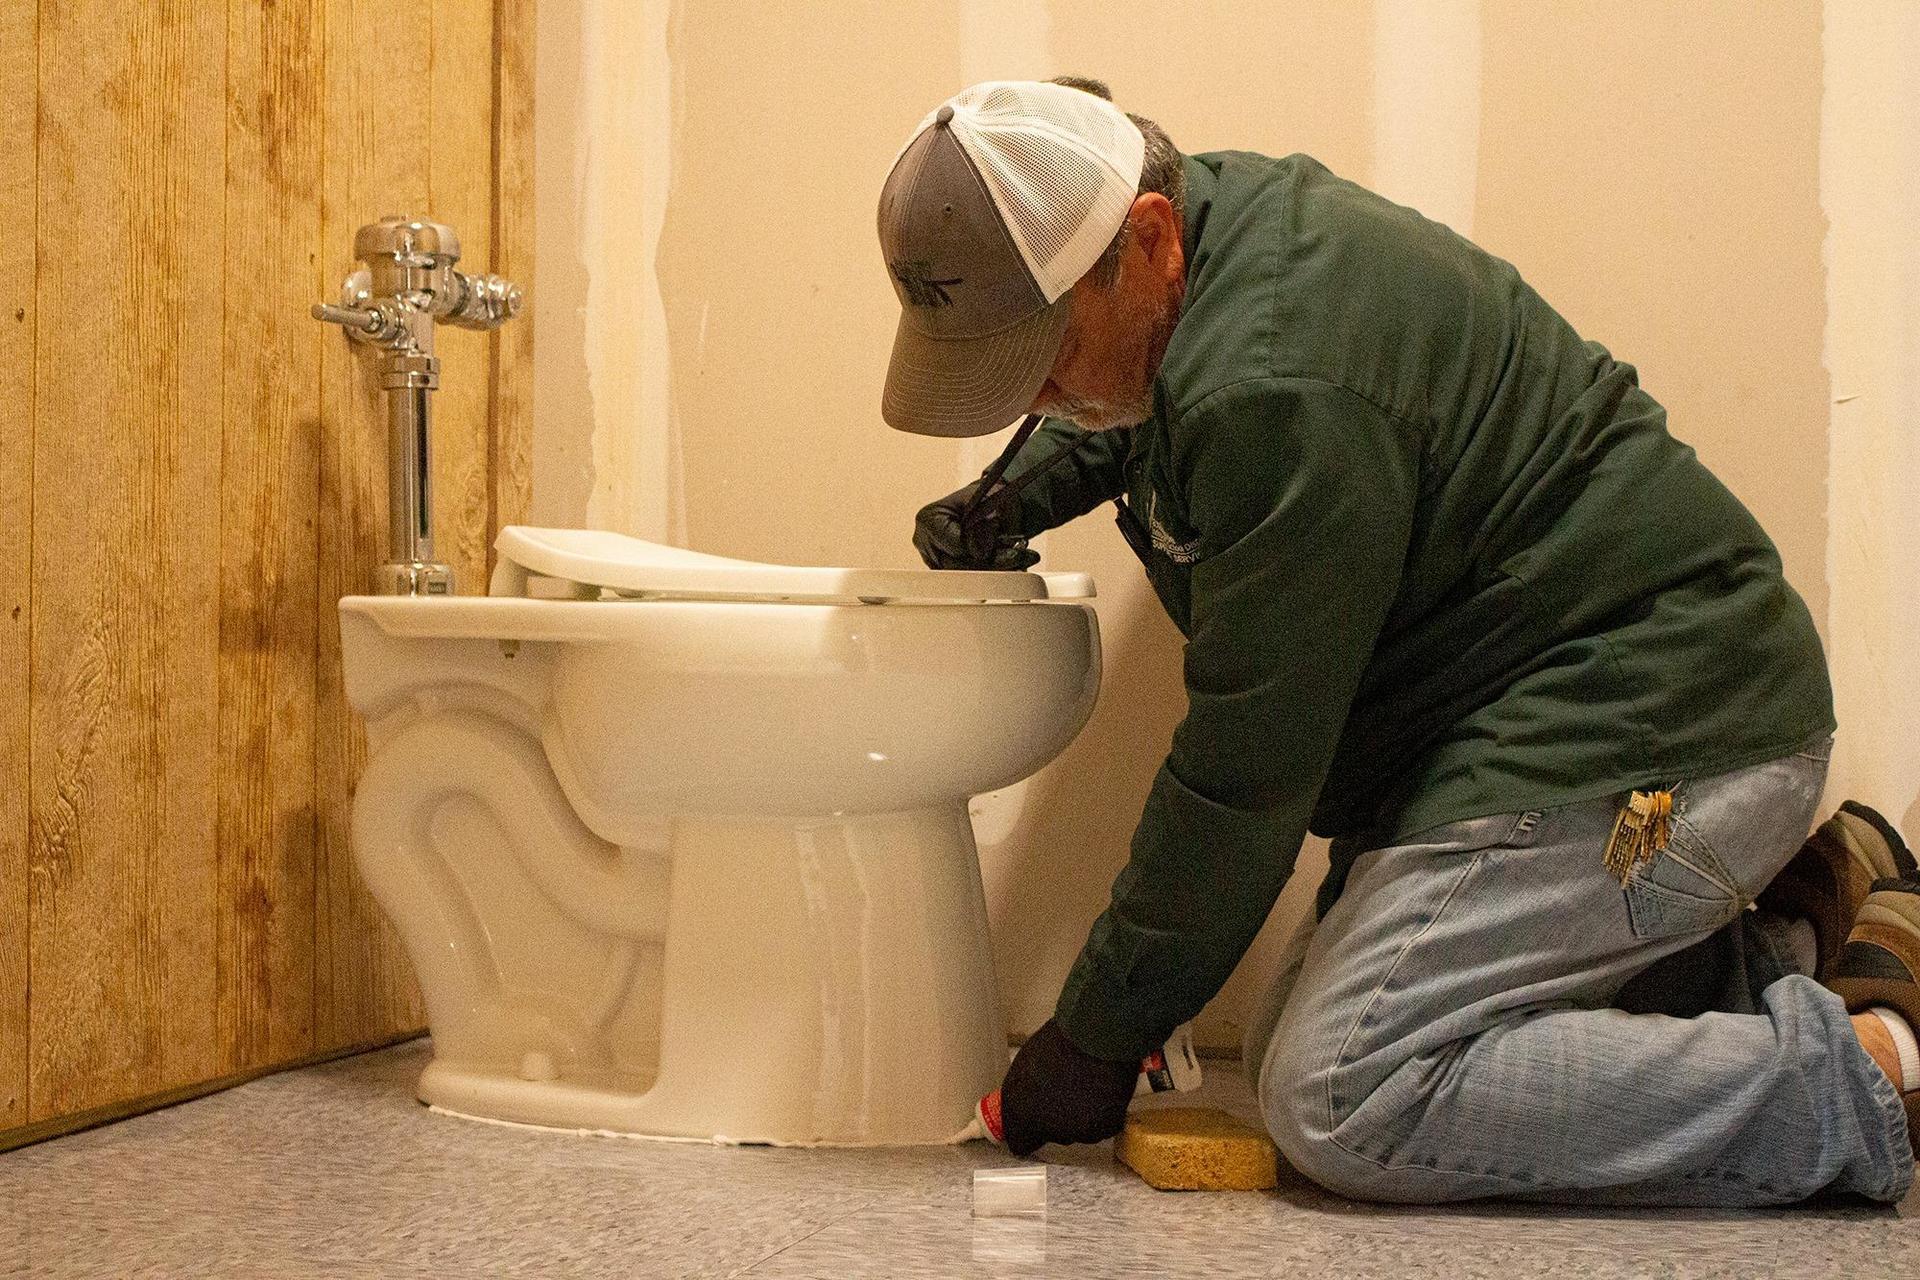 man installing toilet